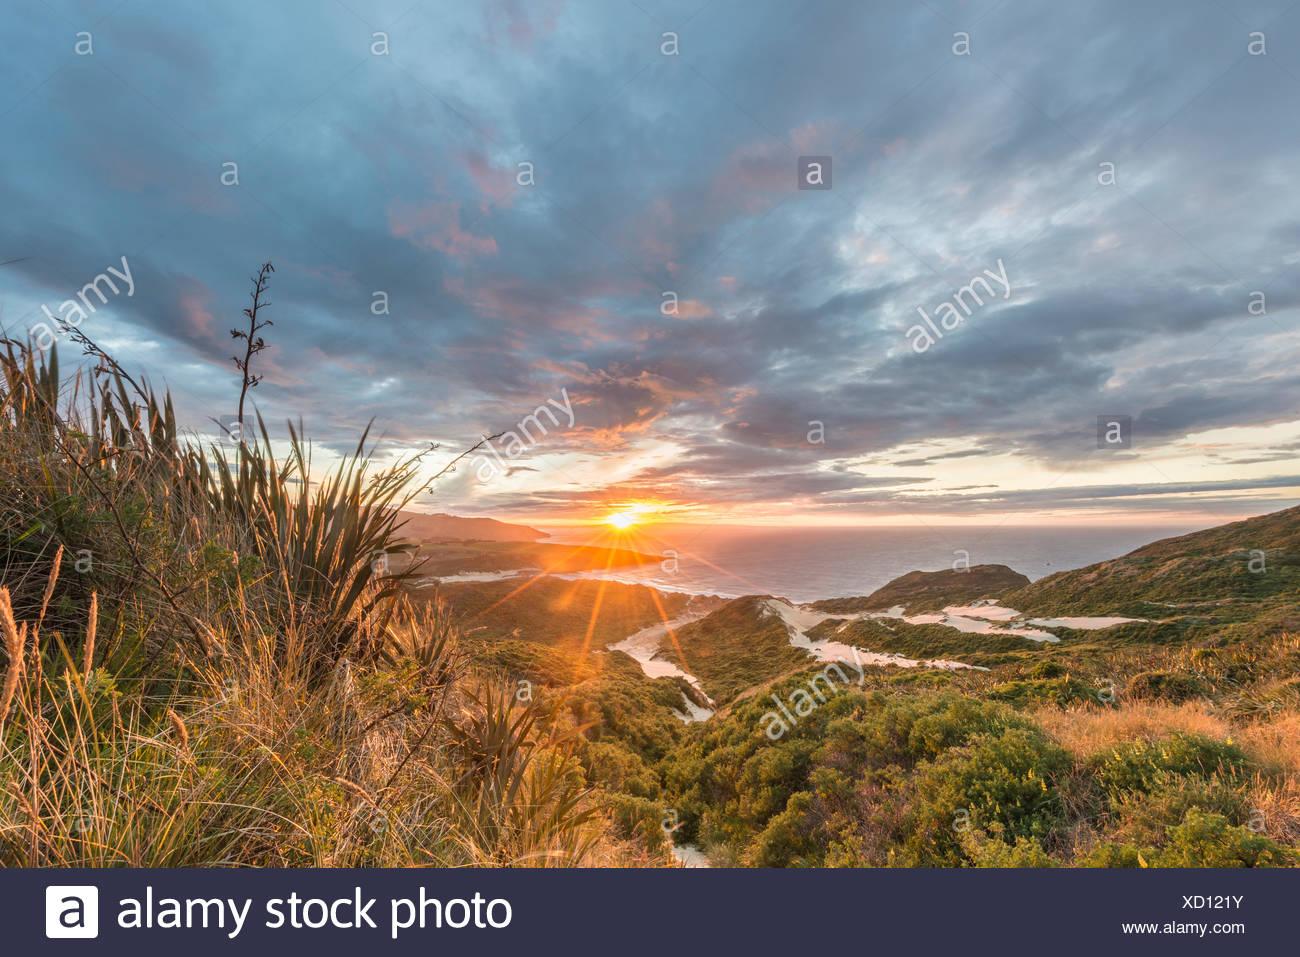 Sunset over the sea, sand dunes, Sandfly Bay, Dunedin, Otago, Otago Peninsula, Southland, New Zealand - Stock Image